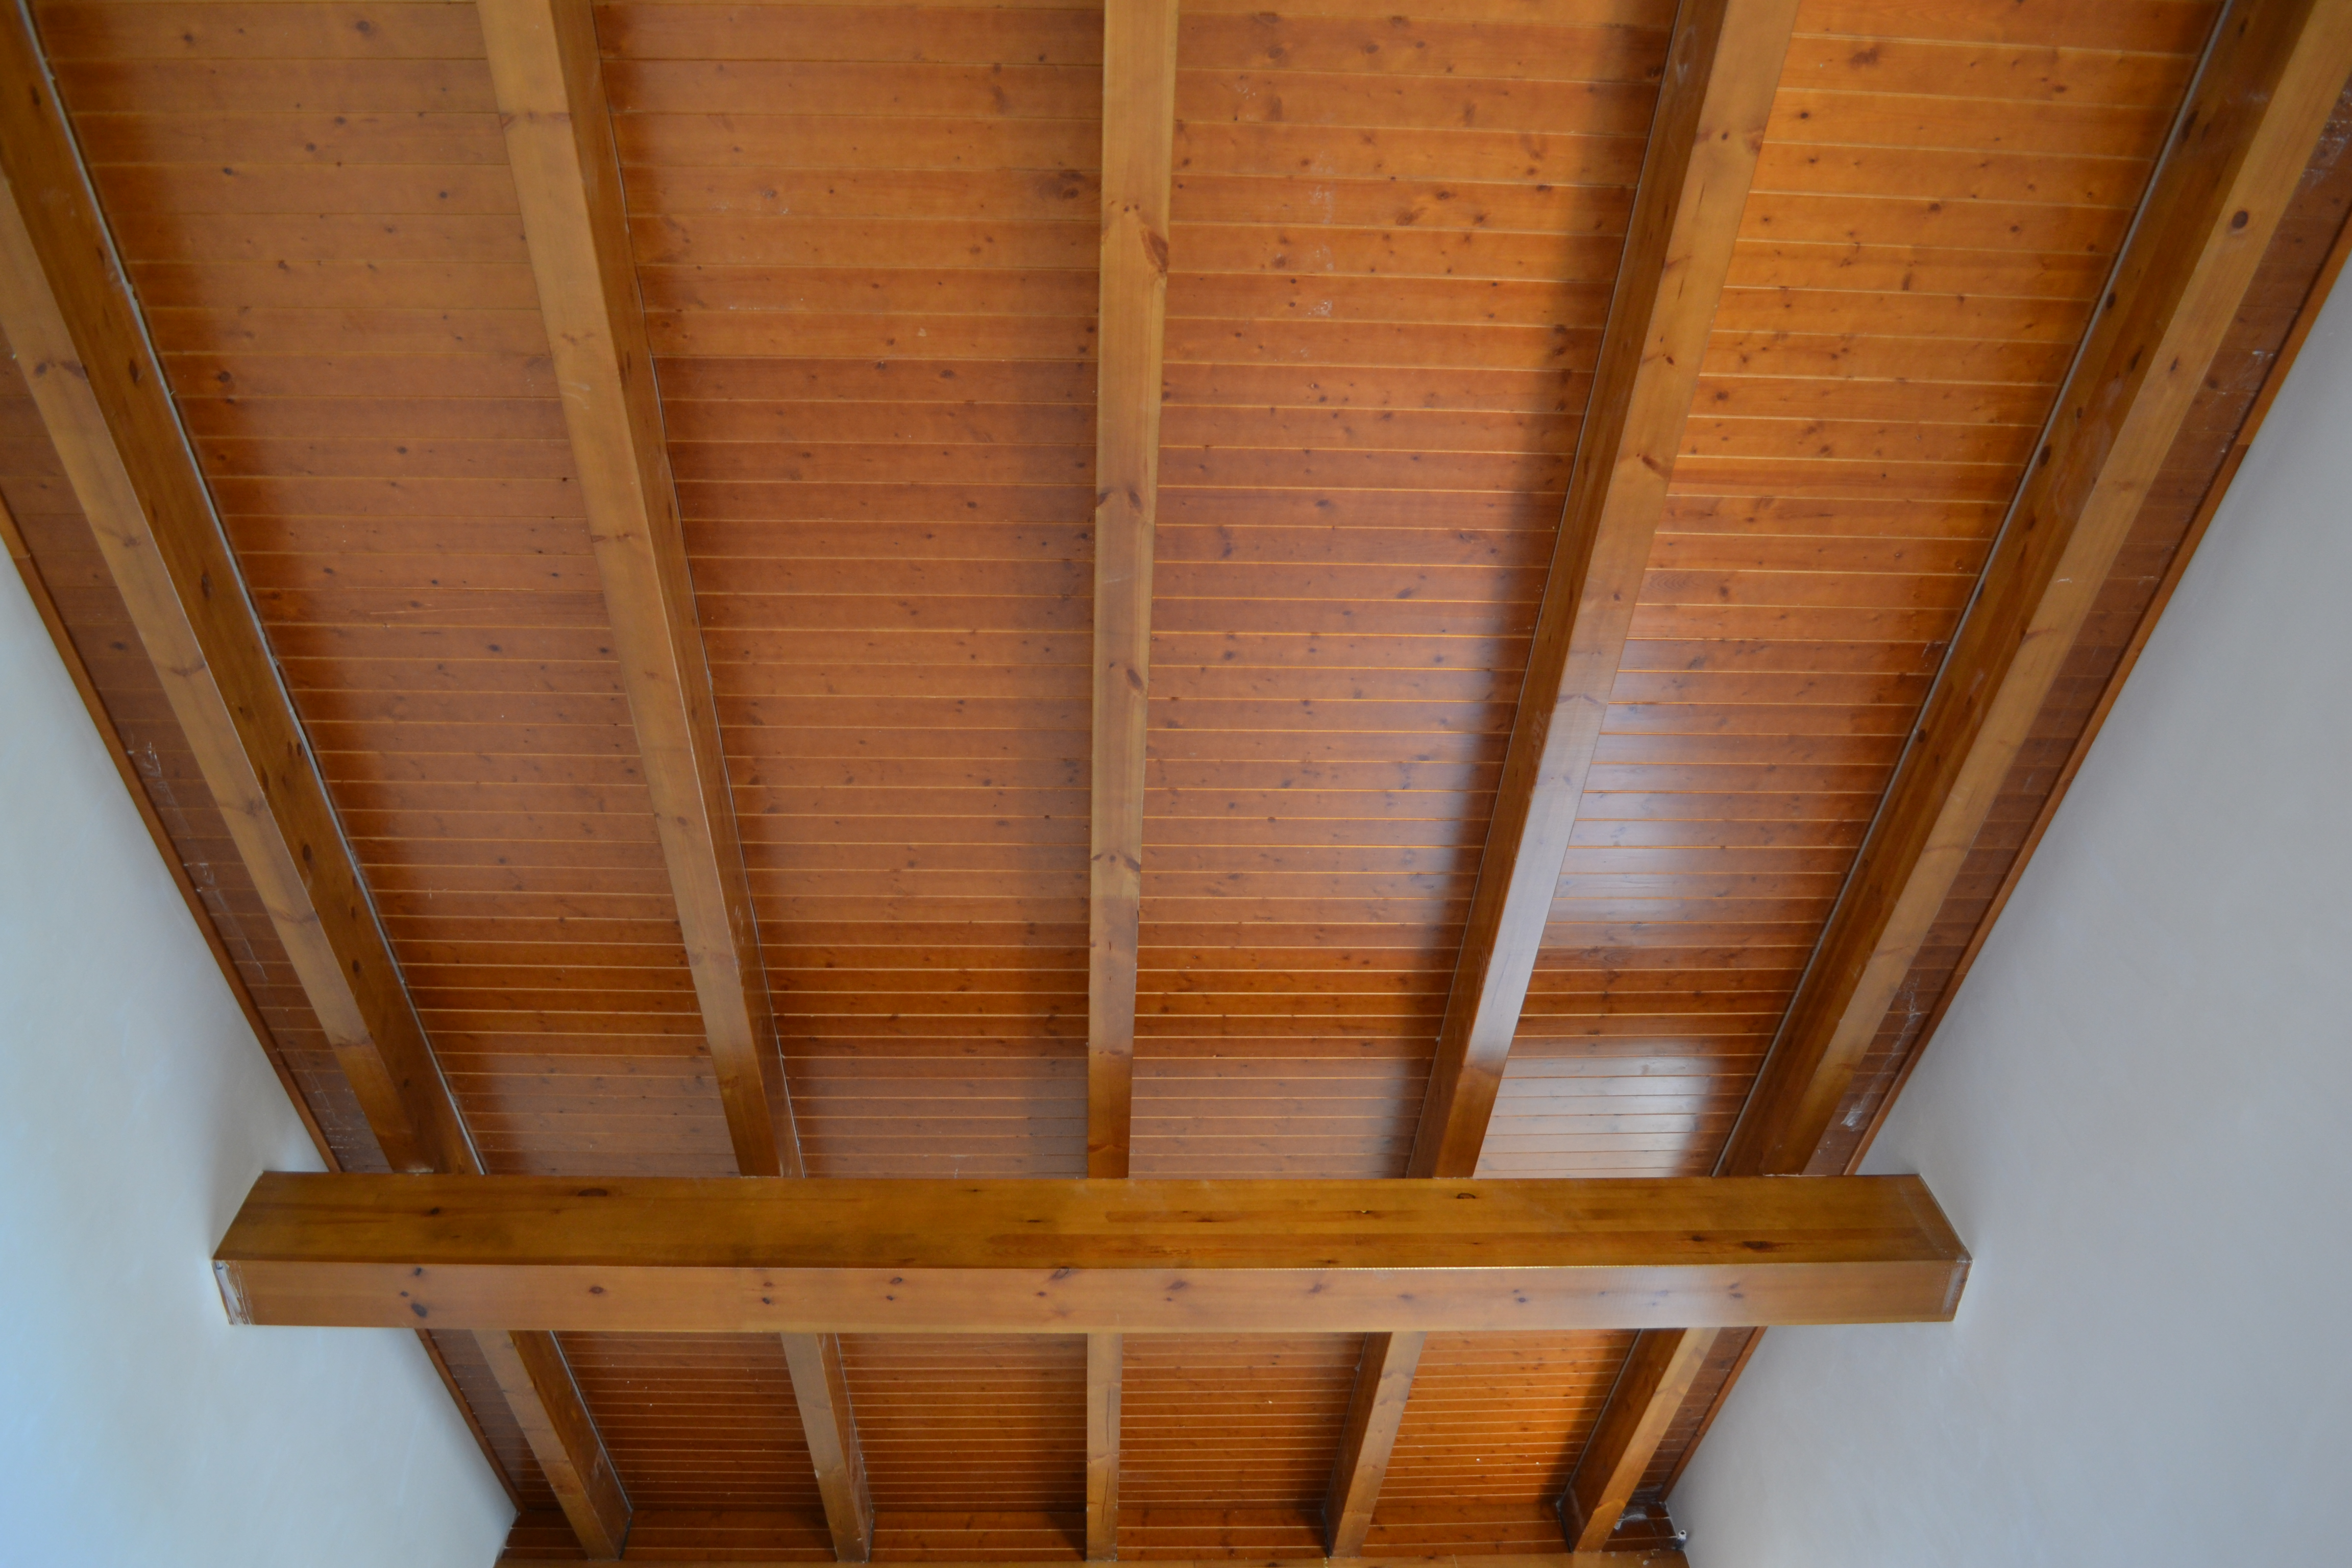 Tejados de madera laminada opci n perfecta incofusta - Casas de madera laminada ...